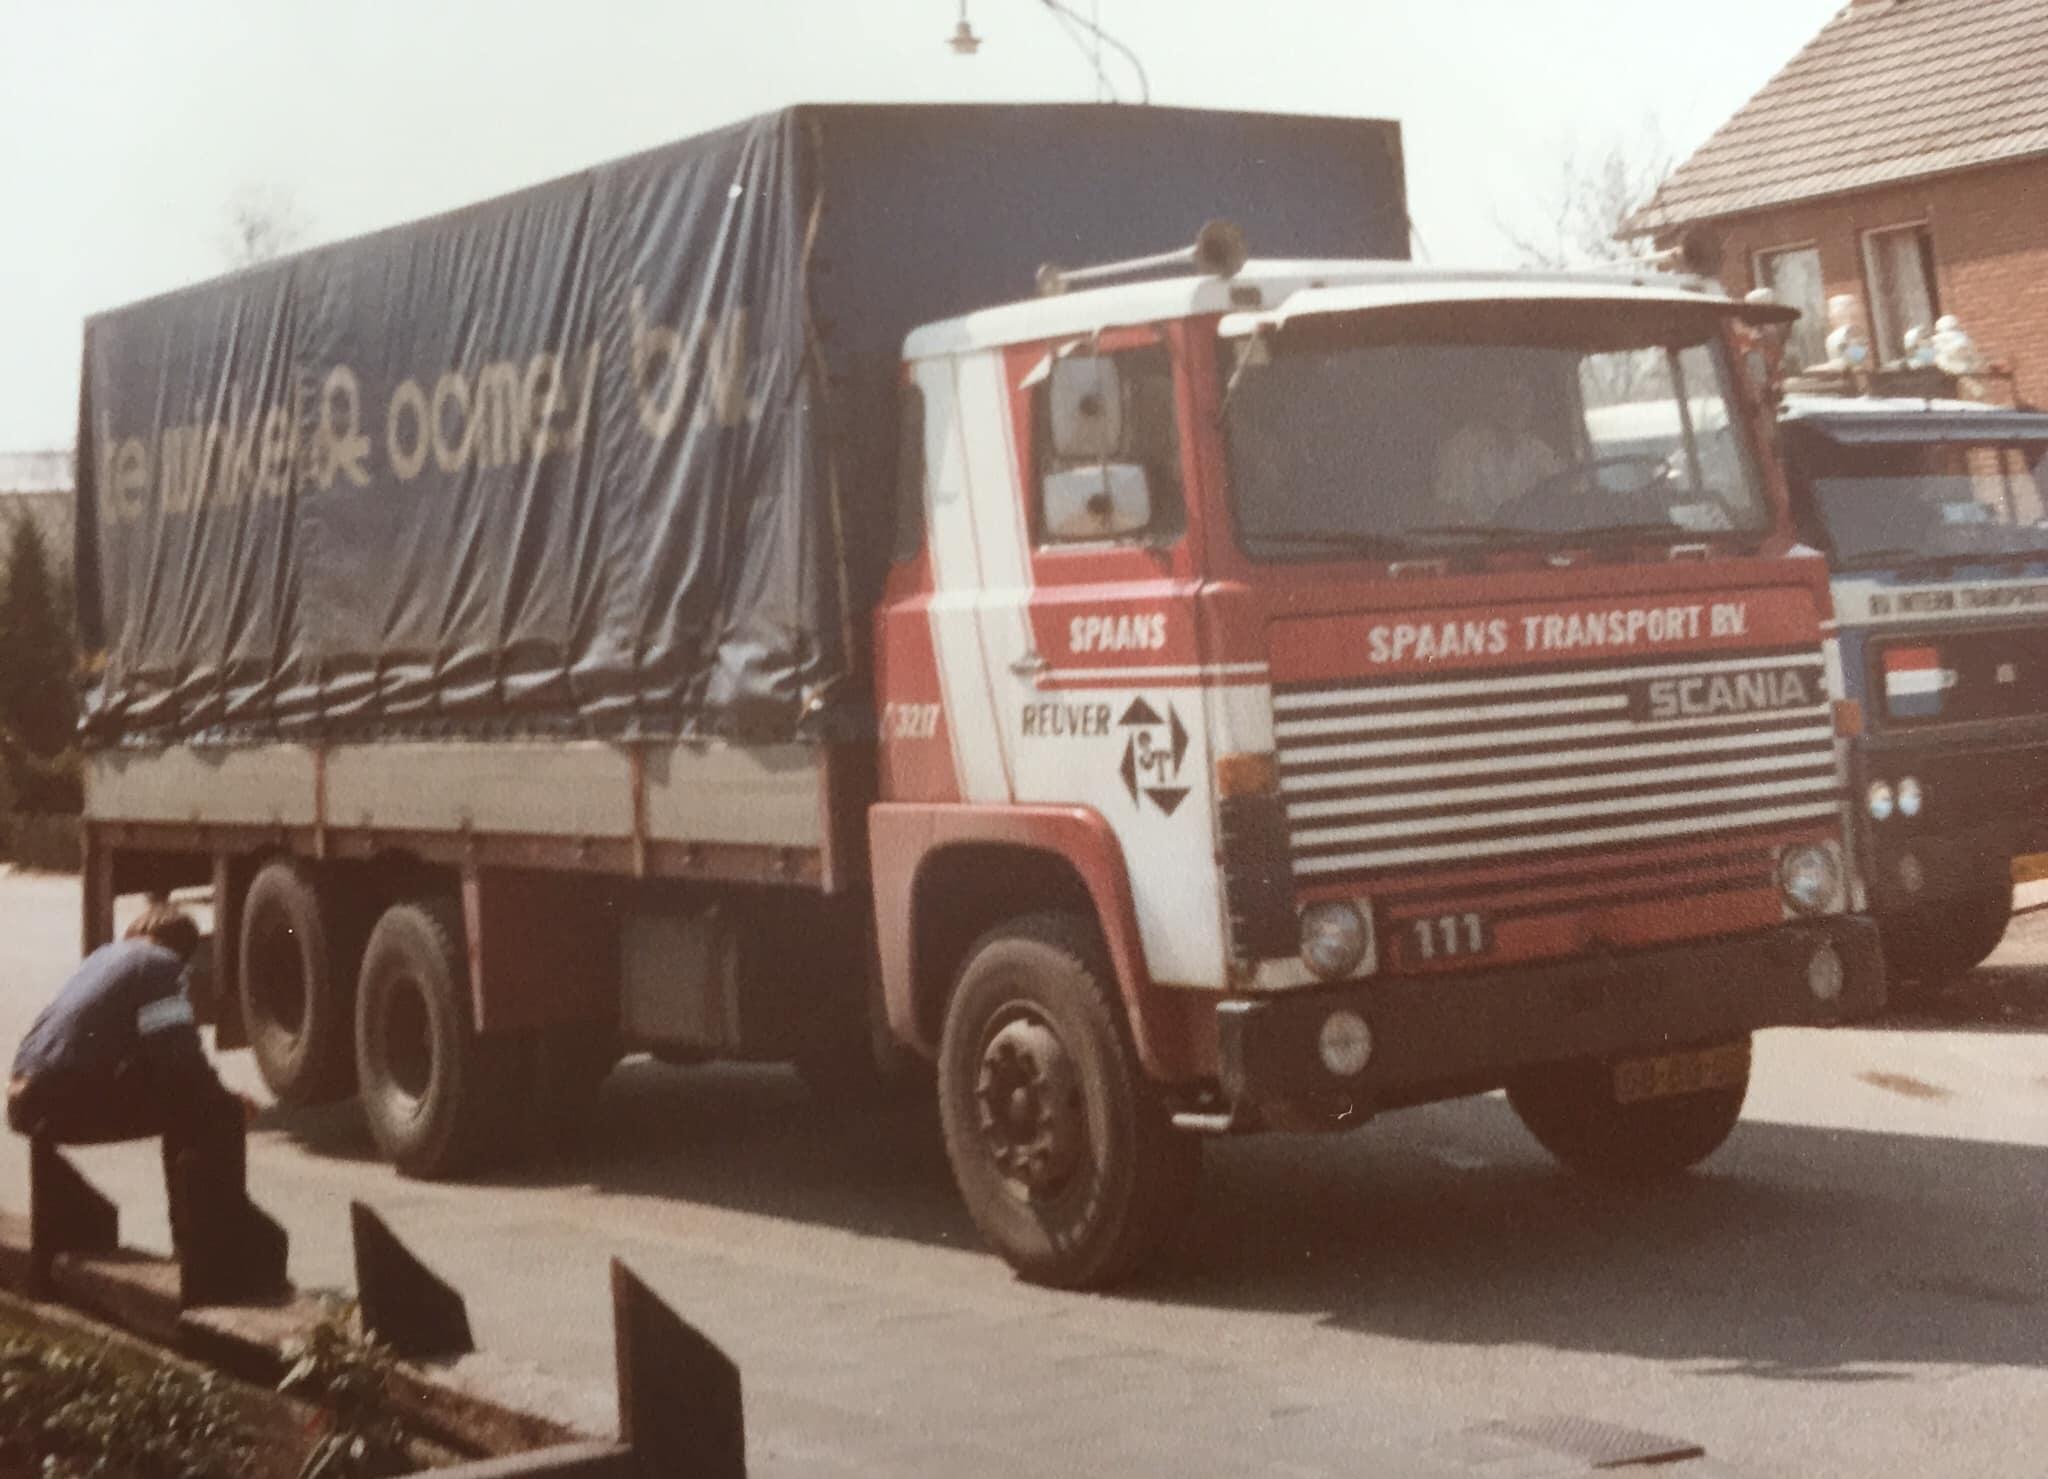 Scania-111-Harrie-Spaans-archief